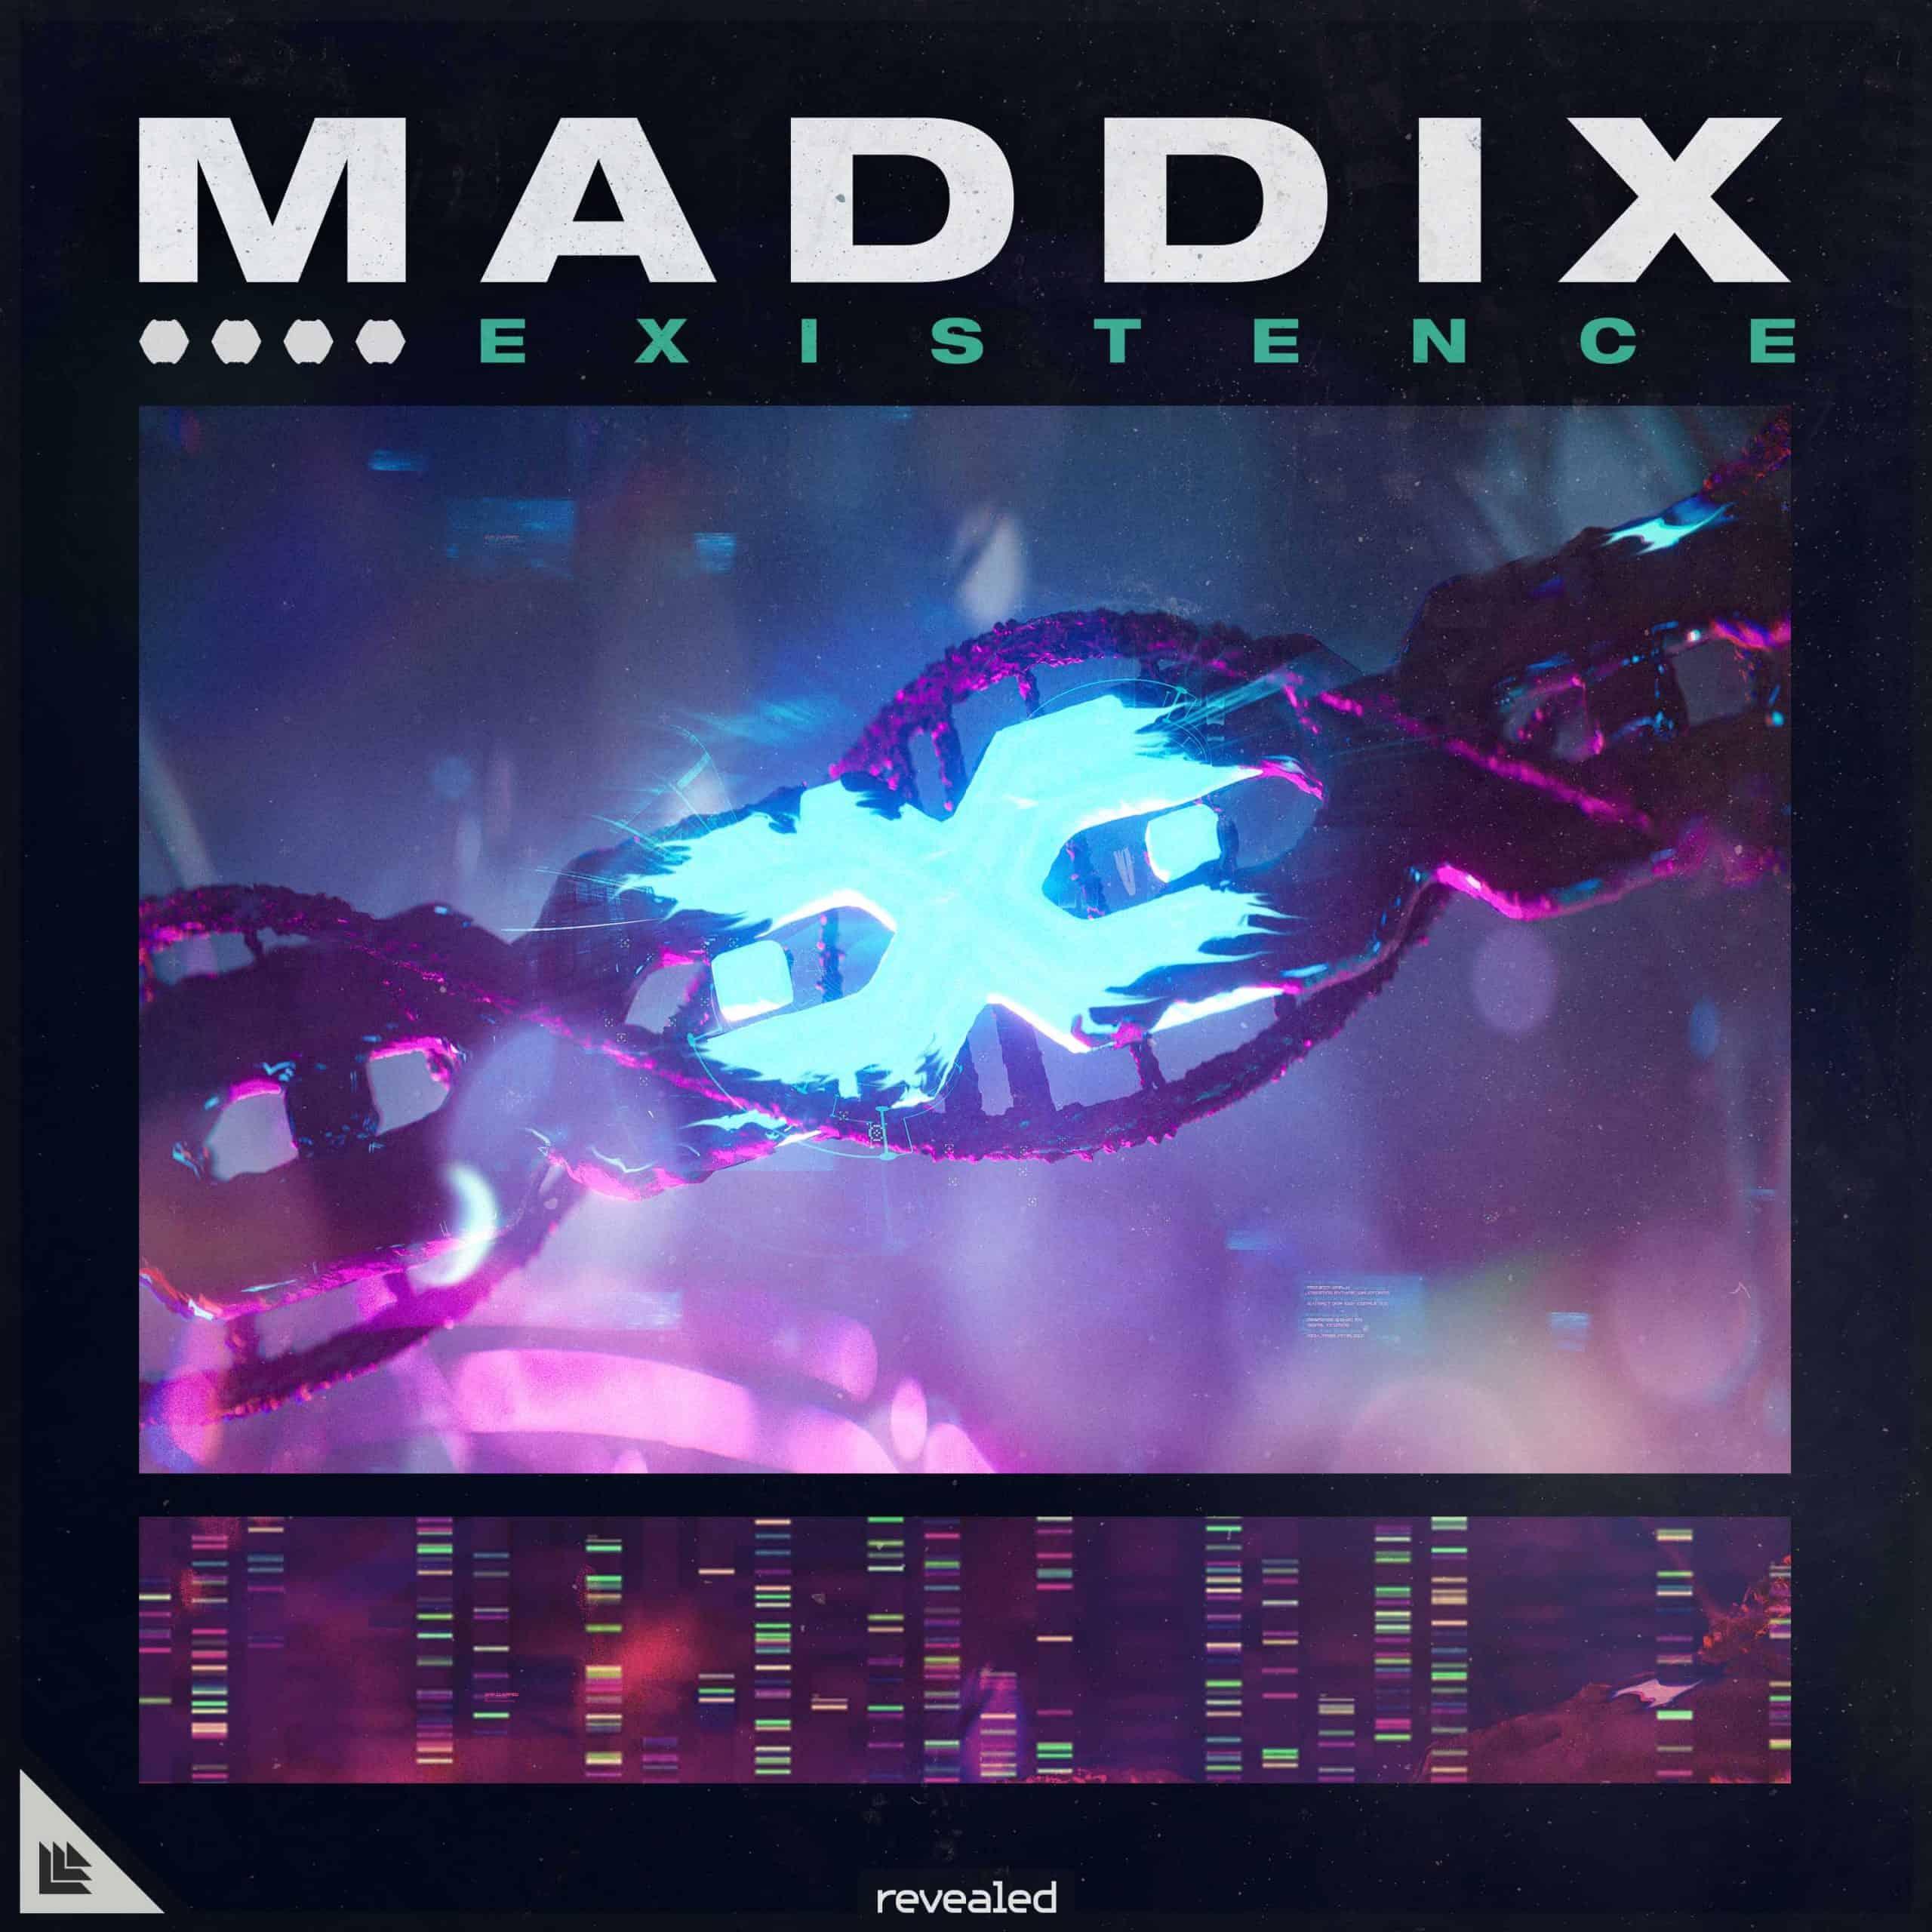 Maddix-Existence-Artwork